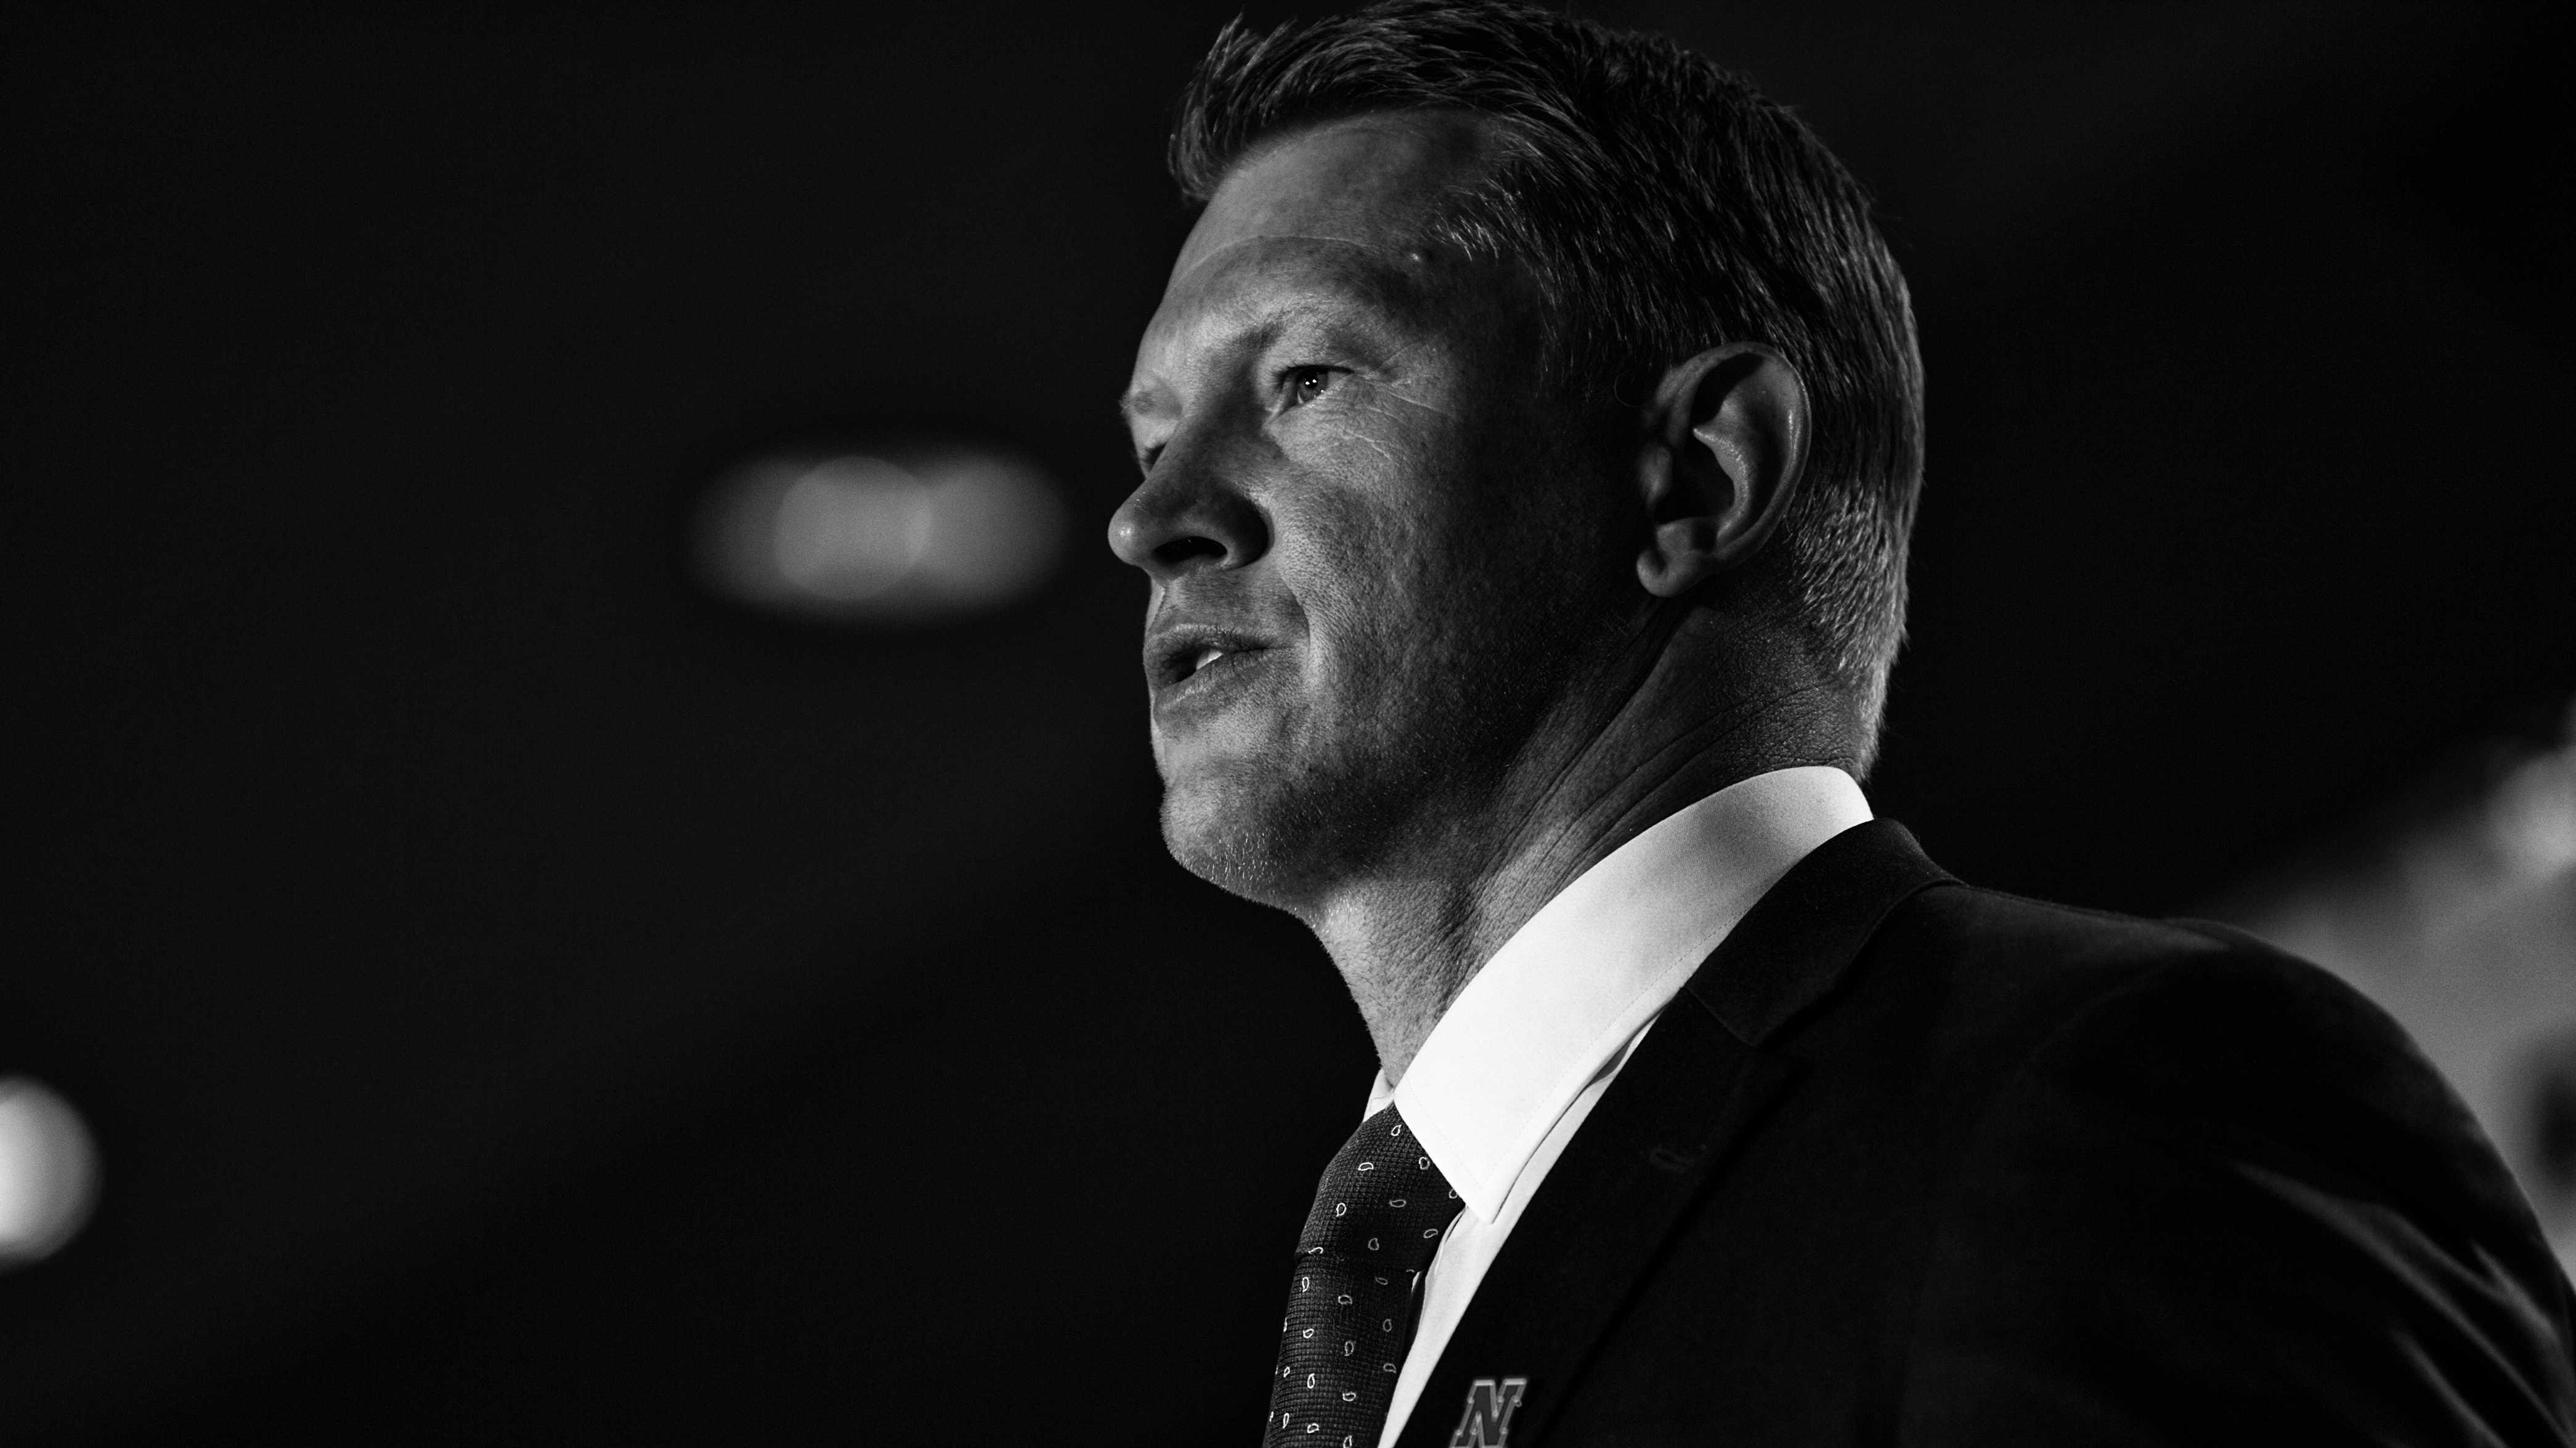 Nebraska Head Coach Scott Frost addresses the media at Big Ten Football Media Days in Chicago on Monday, July 23, 2018. (Nick Rohlman/The Daily Iowan)